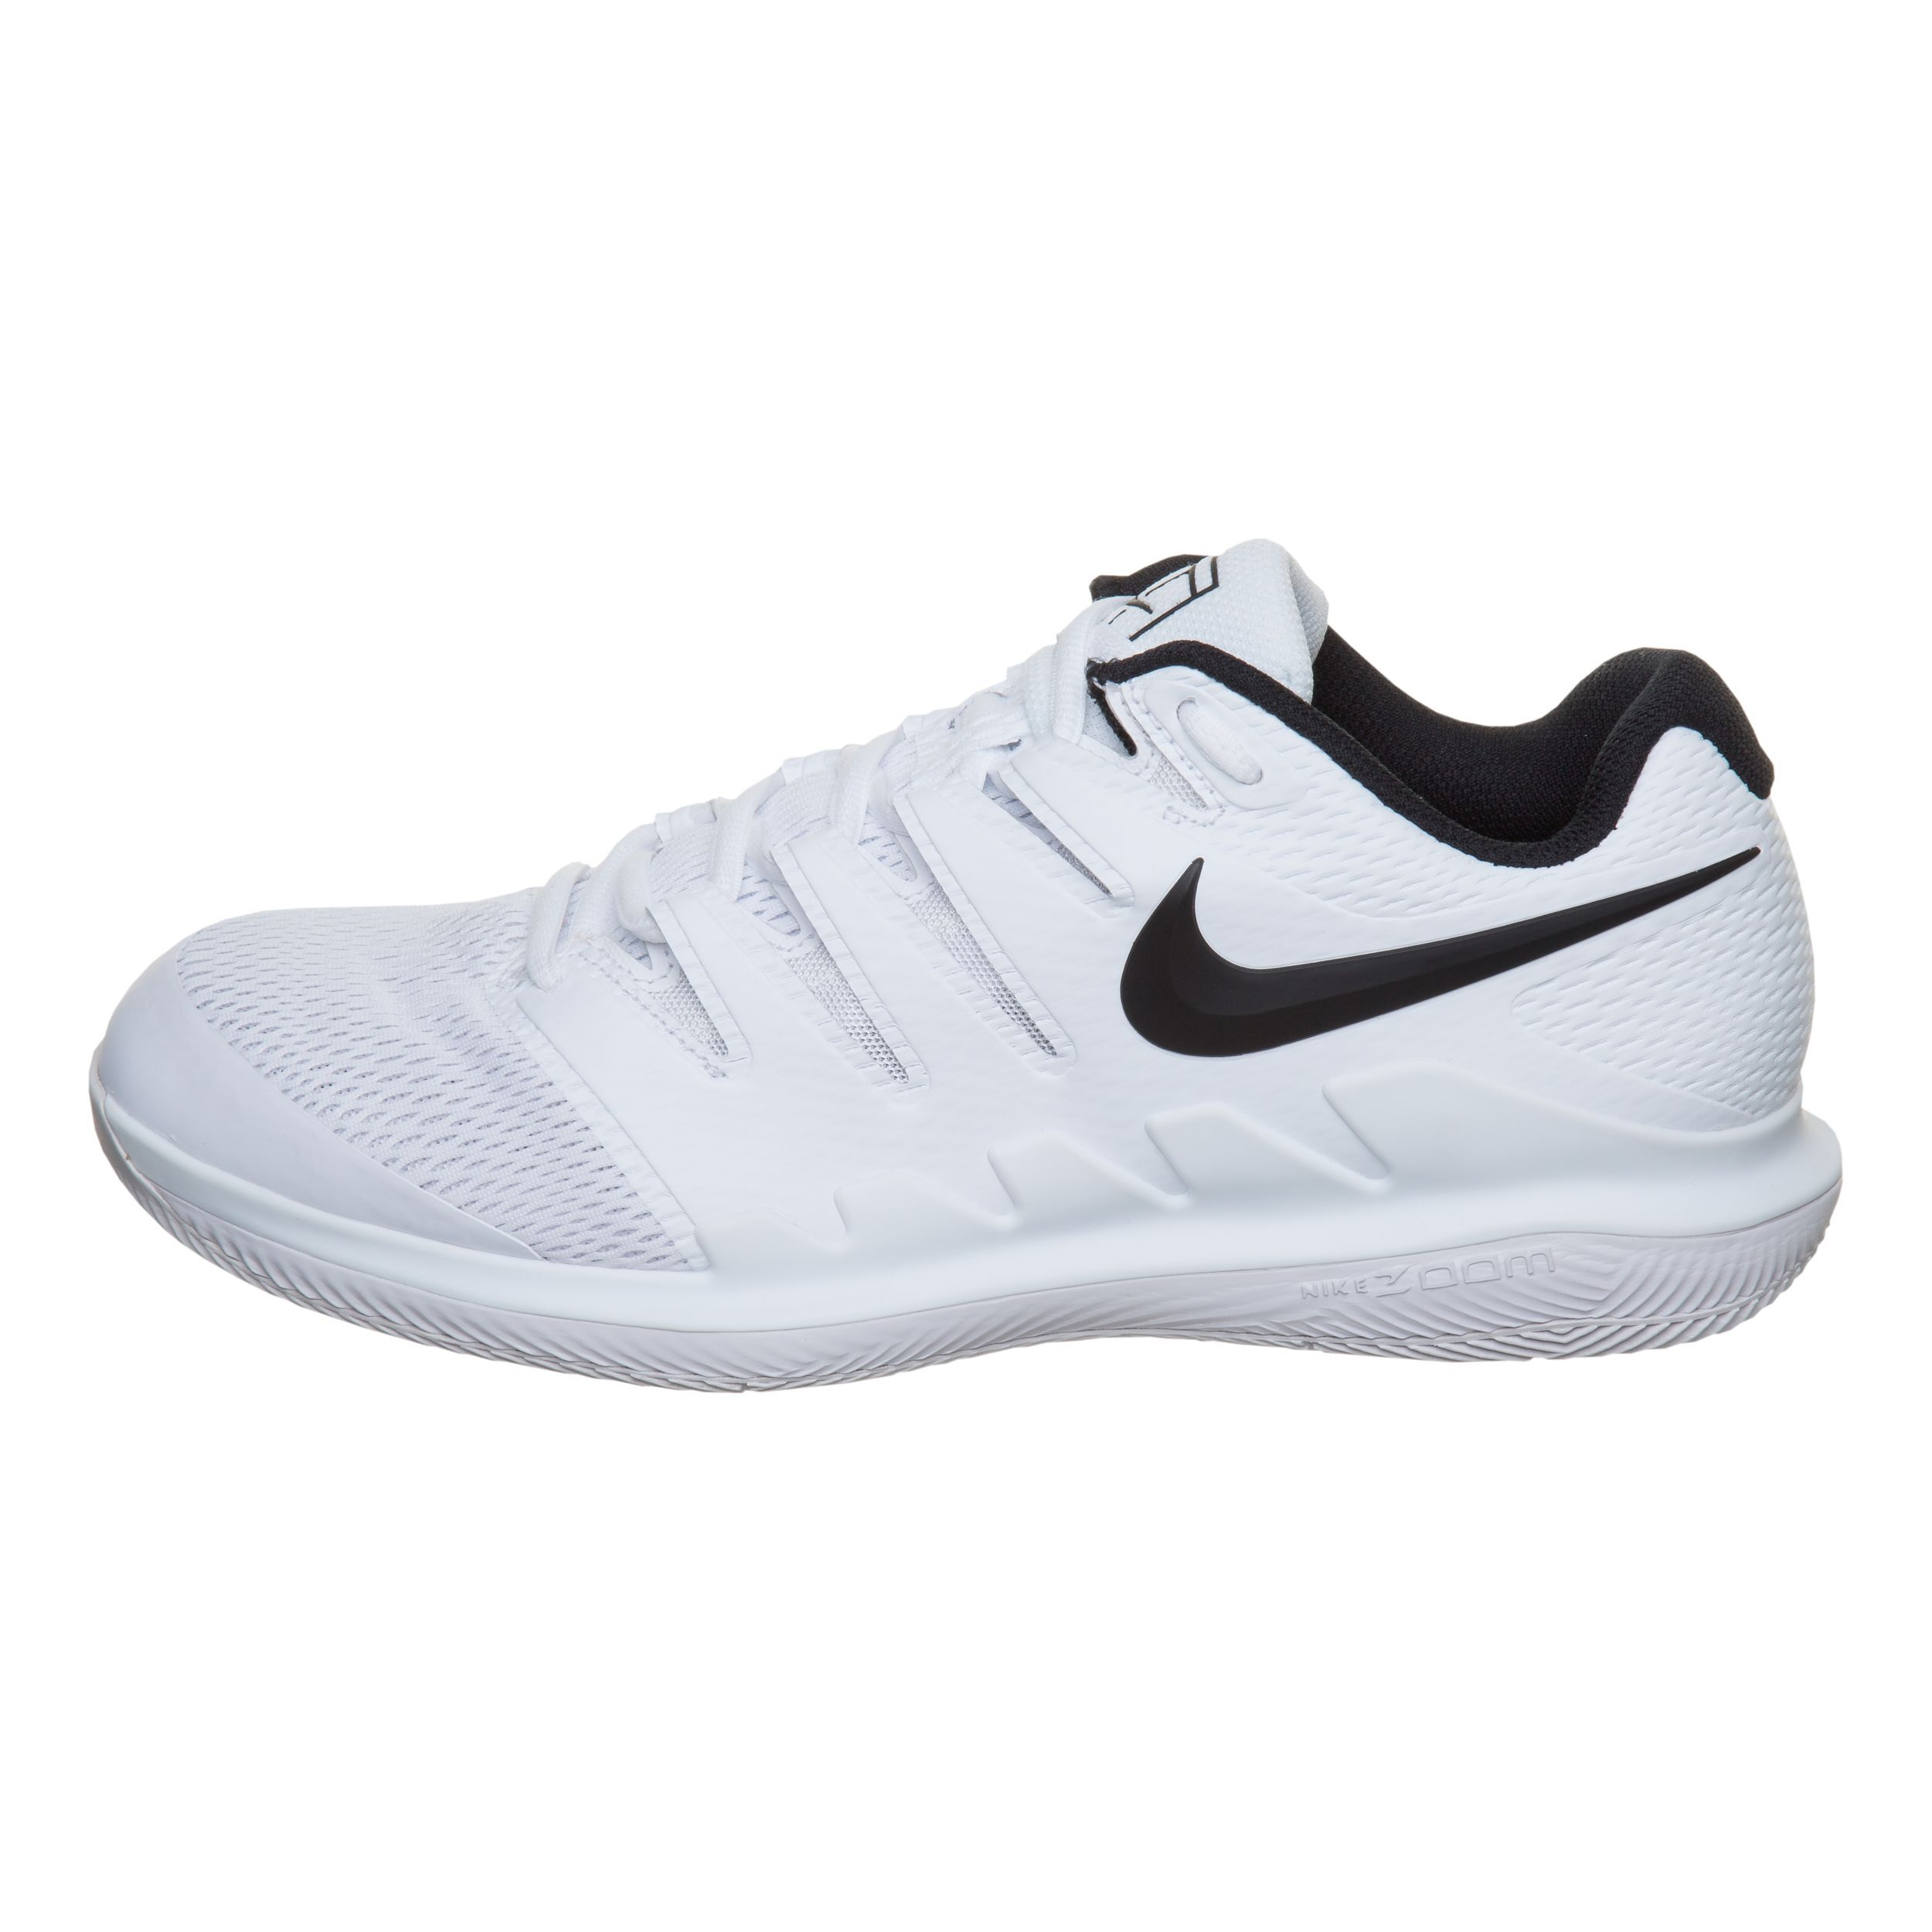 Nike Air Zoom Vapor X Allcourt sko Herrer Hvid, Sort køb